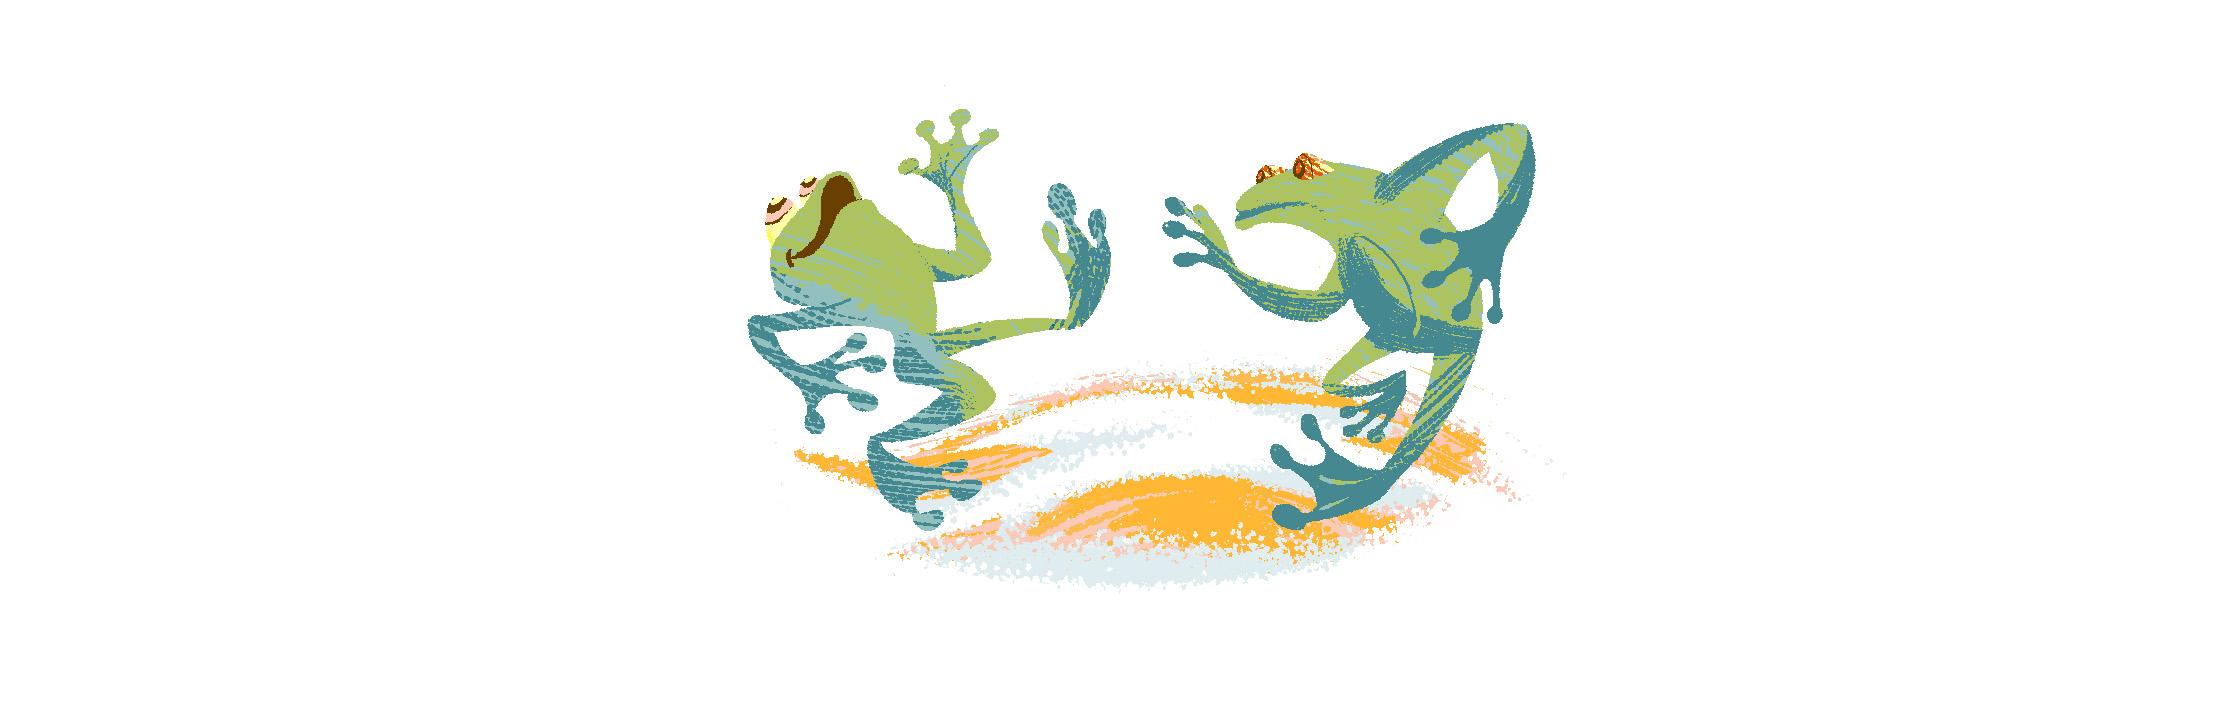 HaydenCurrie-Illustration-ShannonAndTheClams-Frogs.jpg